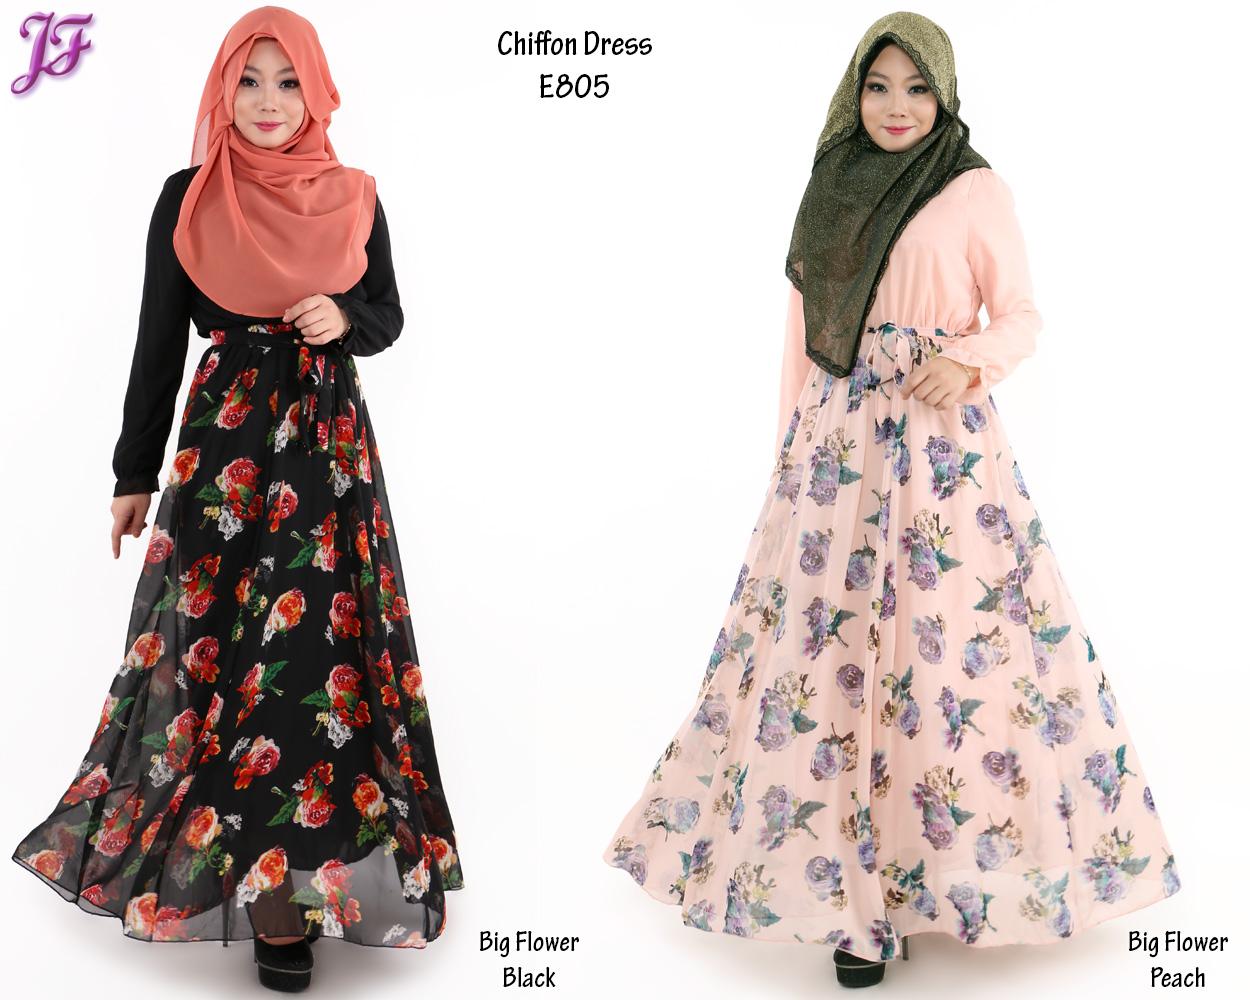 Printed Chiffon Dresses